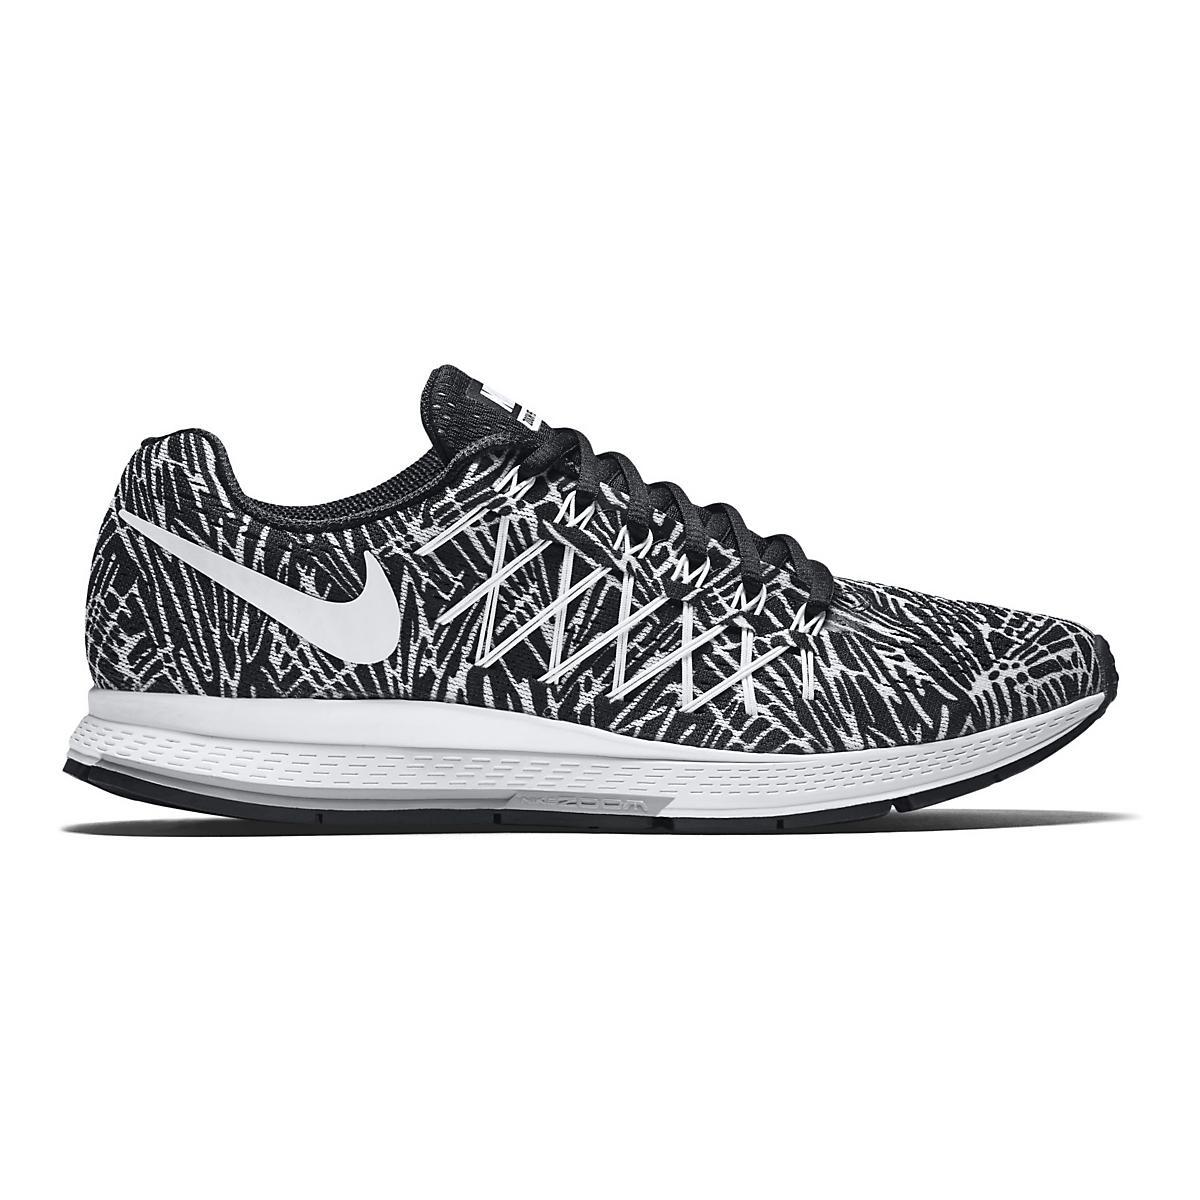 836d23bc17f63 ... inexpensive womens nike air zoom pegasus 32 print running shoe at road  runner sports 98605 46473